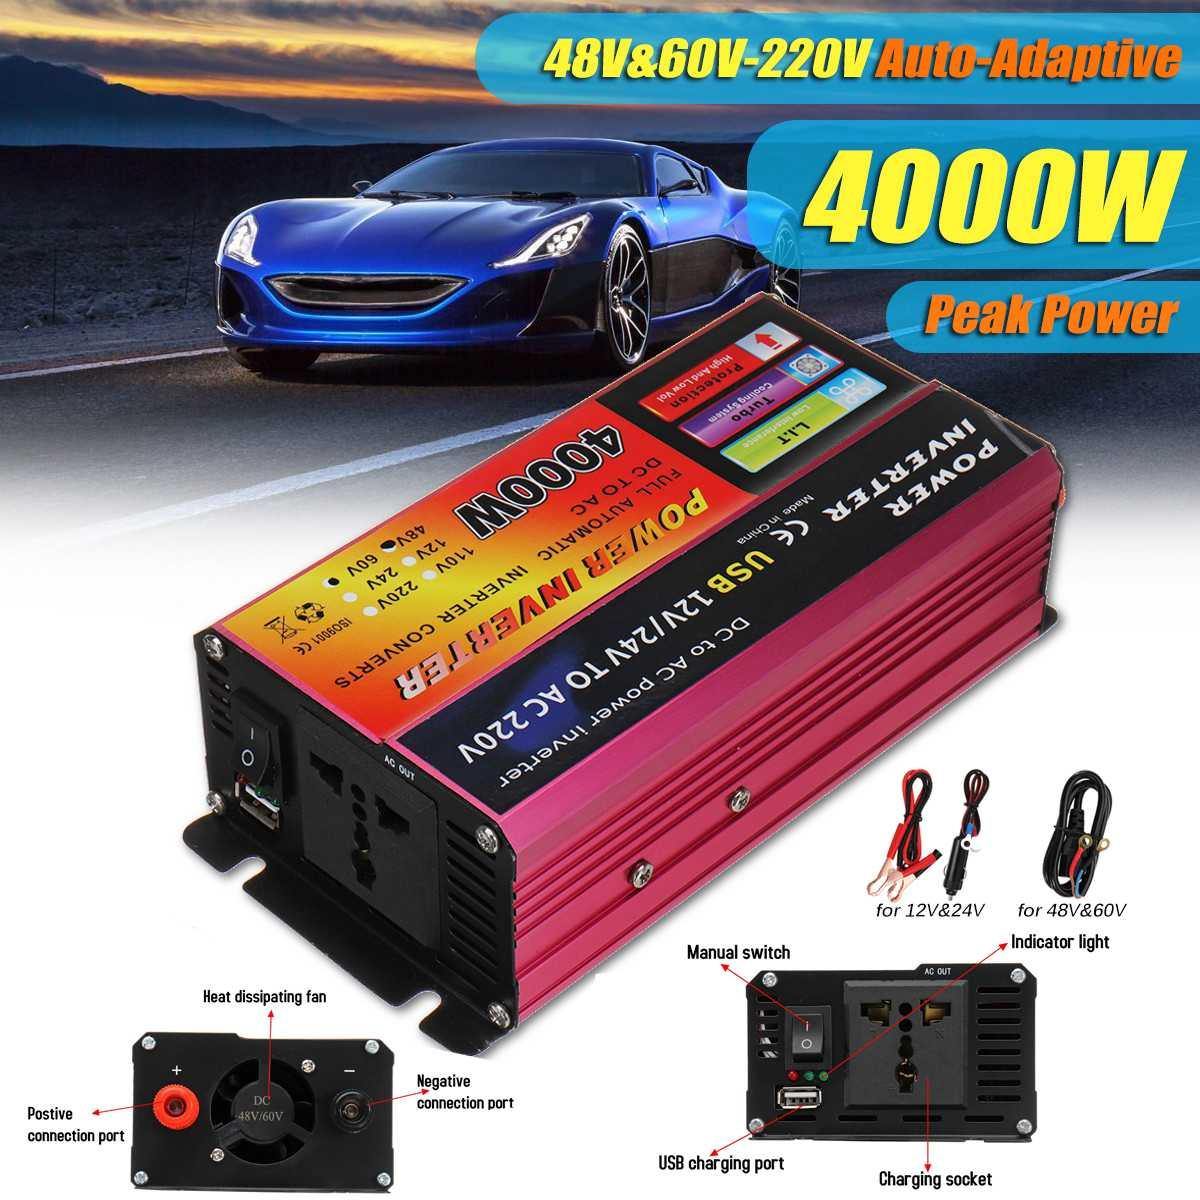 Inversor del coche de 4000W 12 V/24V a 220V Convertidor para Sistema Solar portátil camión recargable vehículos convertidor inversor